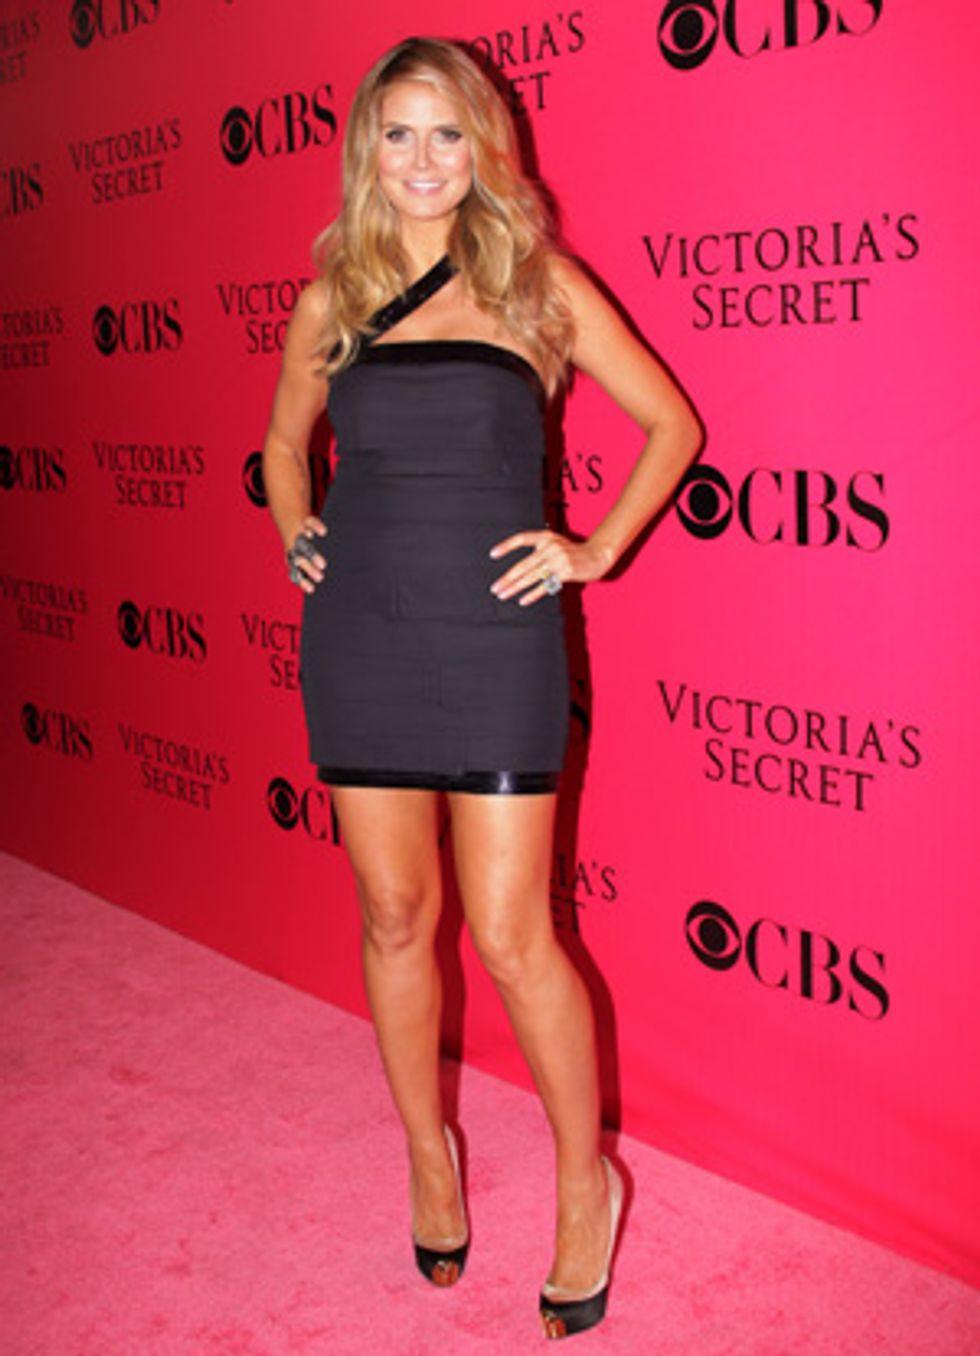 About Last Night... The 2009 Victoria's Secret Pink Carpet Arrivals, Backstage & Fashion Show